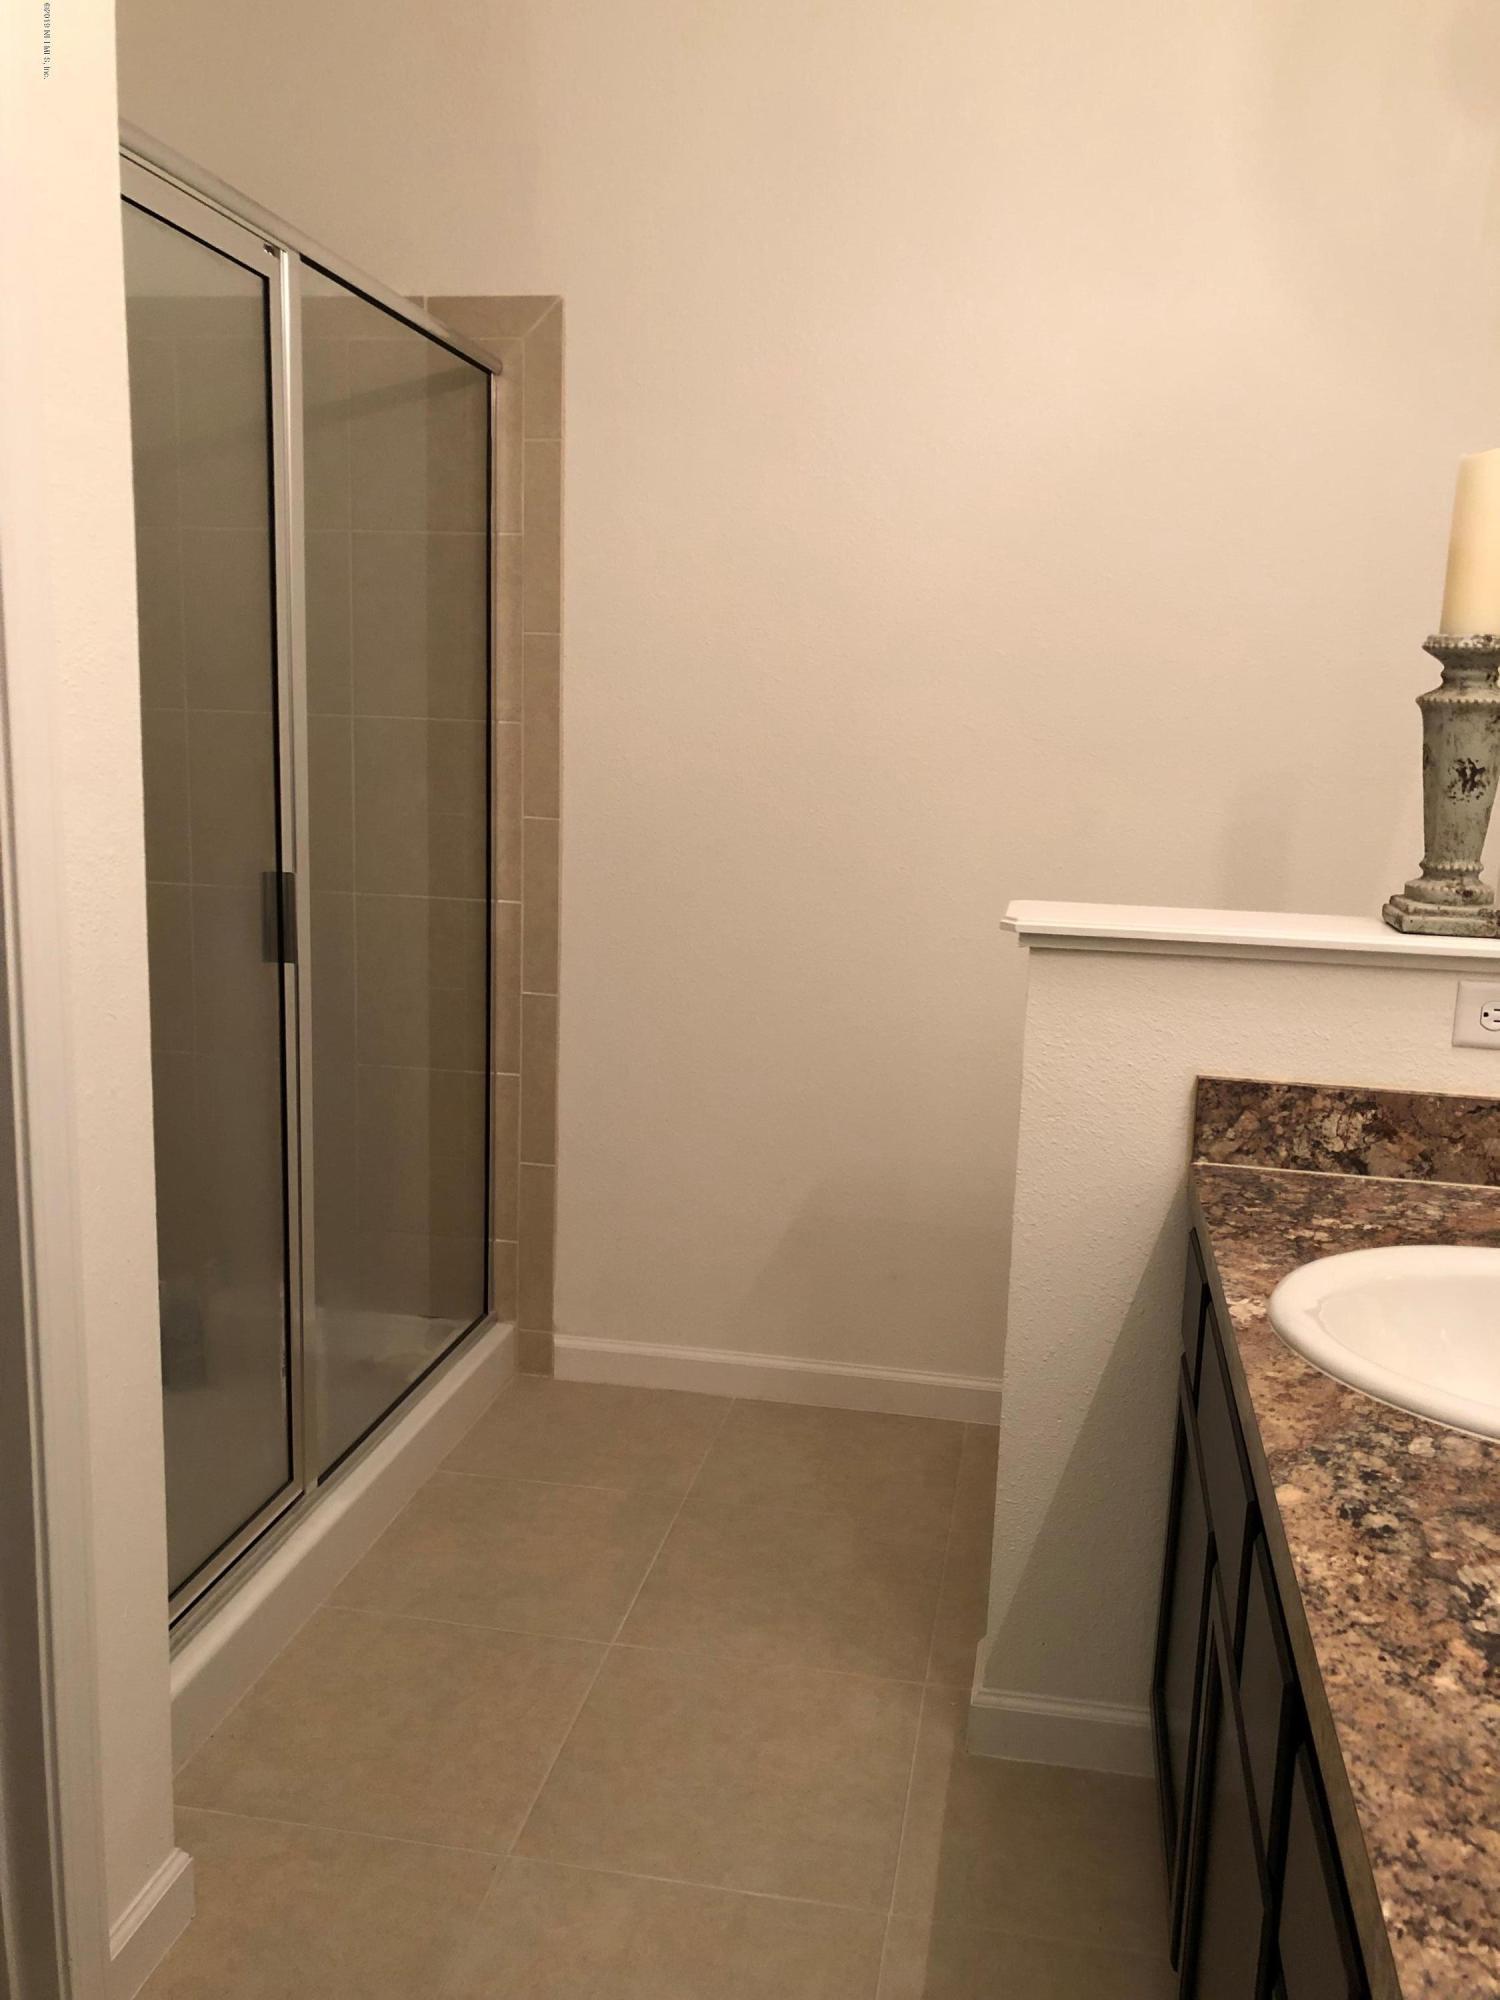 3217 HIDDEN MEADOWS, GREEN COVE SPRINGS, FLORIDA 32043, 5 Bedrooms Bedrooms, ,2 BathroomsBathrooms,Residential - single family,For sale,HIDDEN MEADOWS,989145